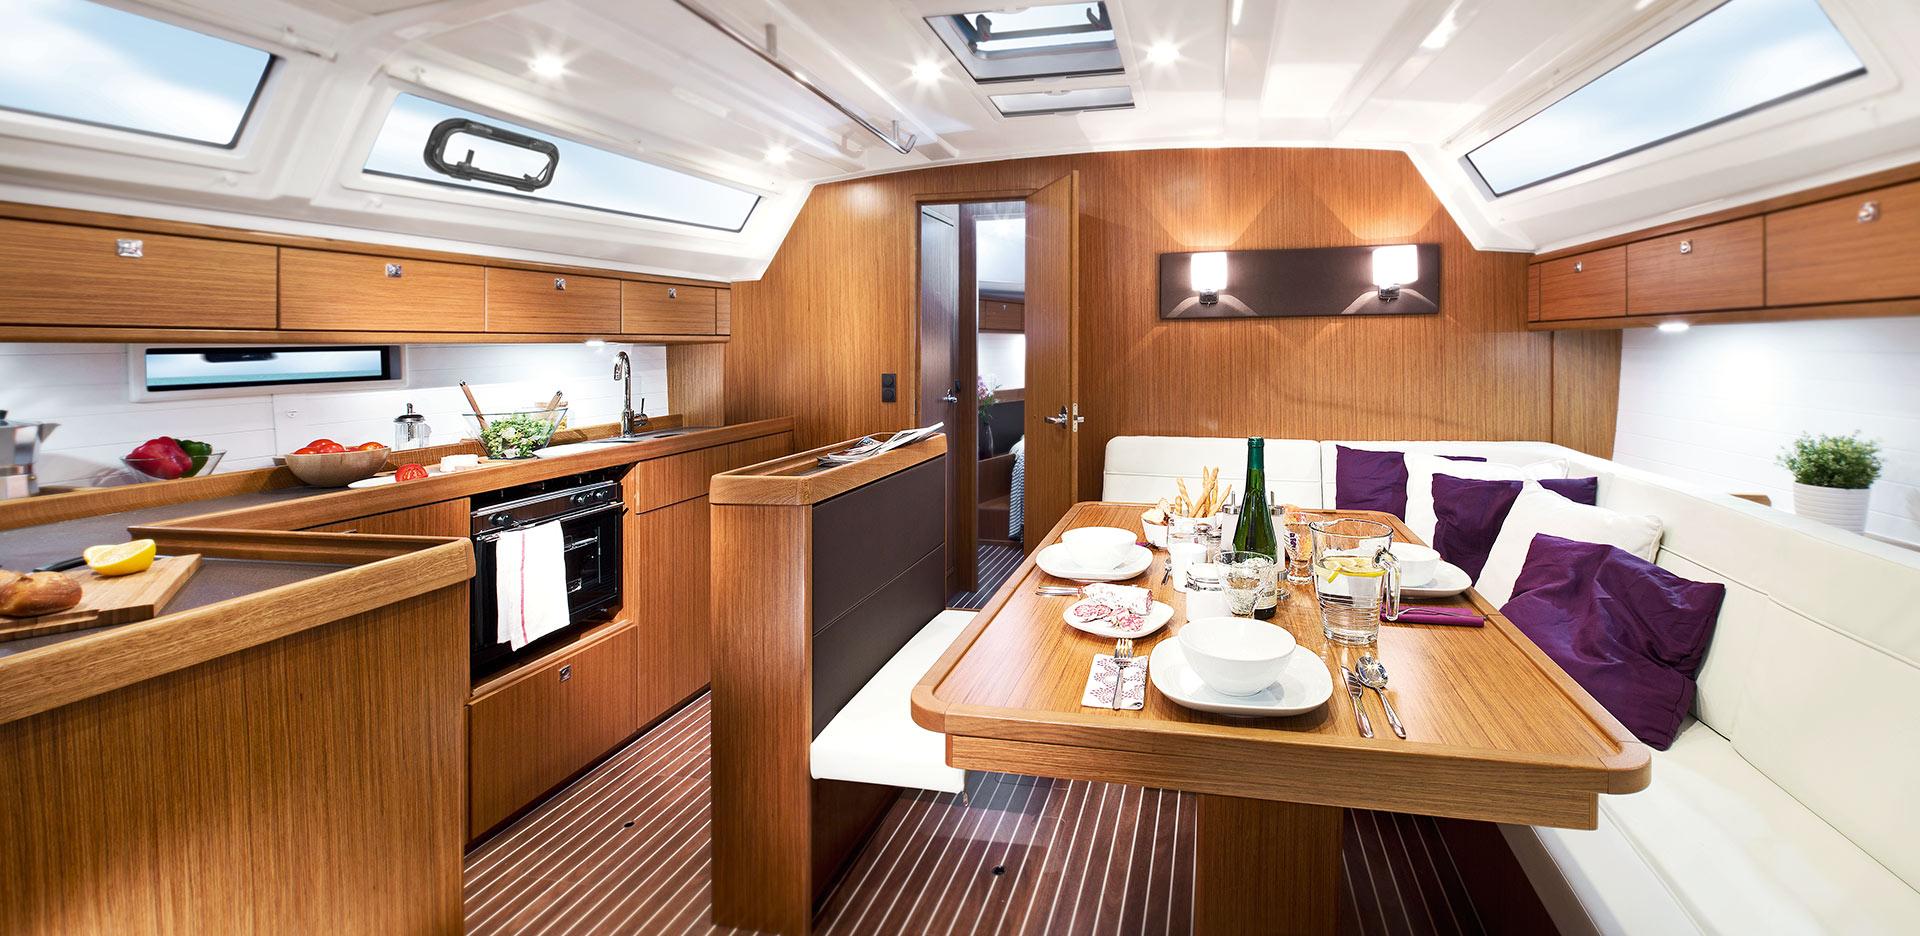 Livig-room-Inchiriere-Petreceri-Croaziere-Vacante-Yacht-Bavaria-Cruise46_1